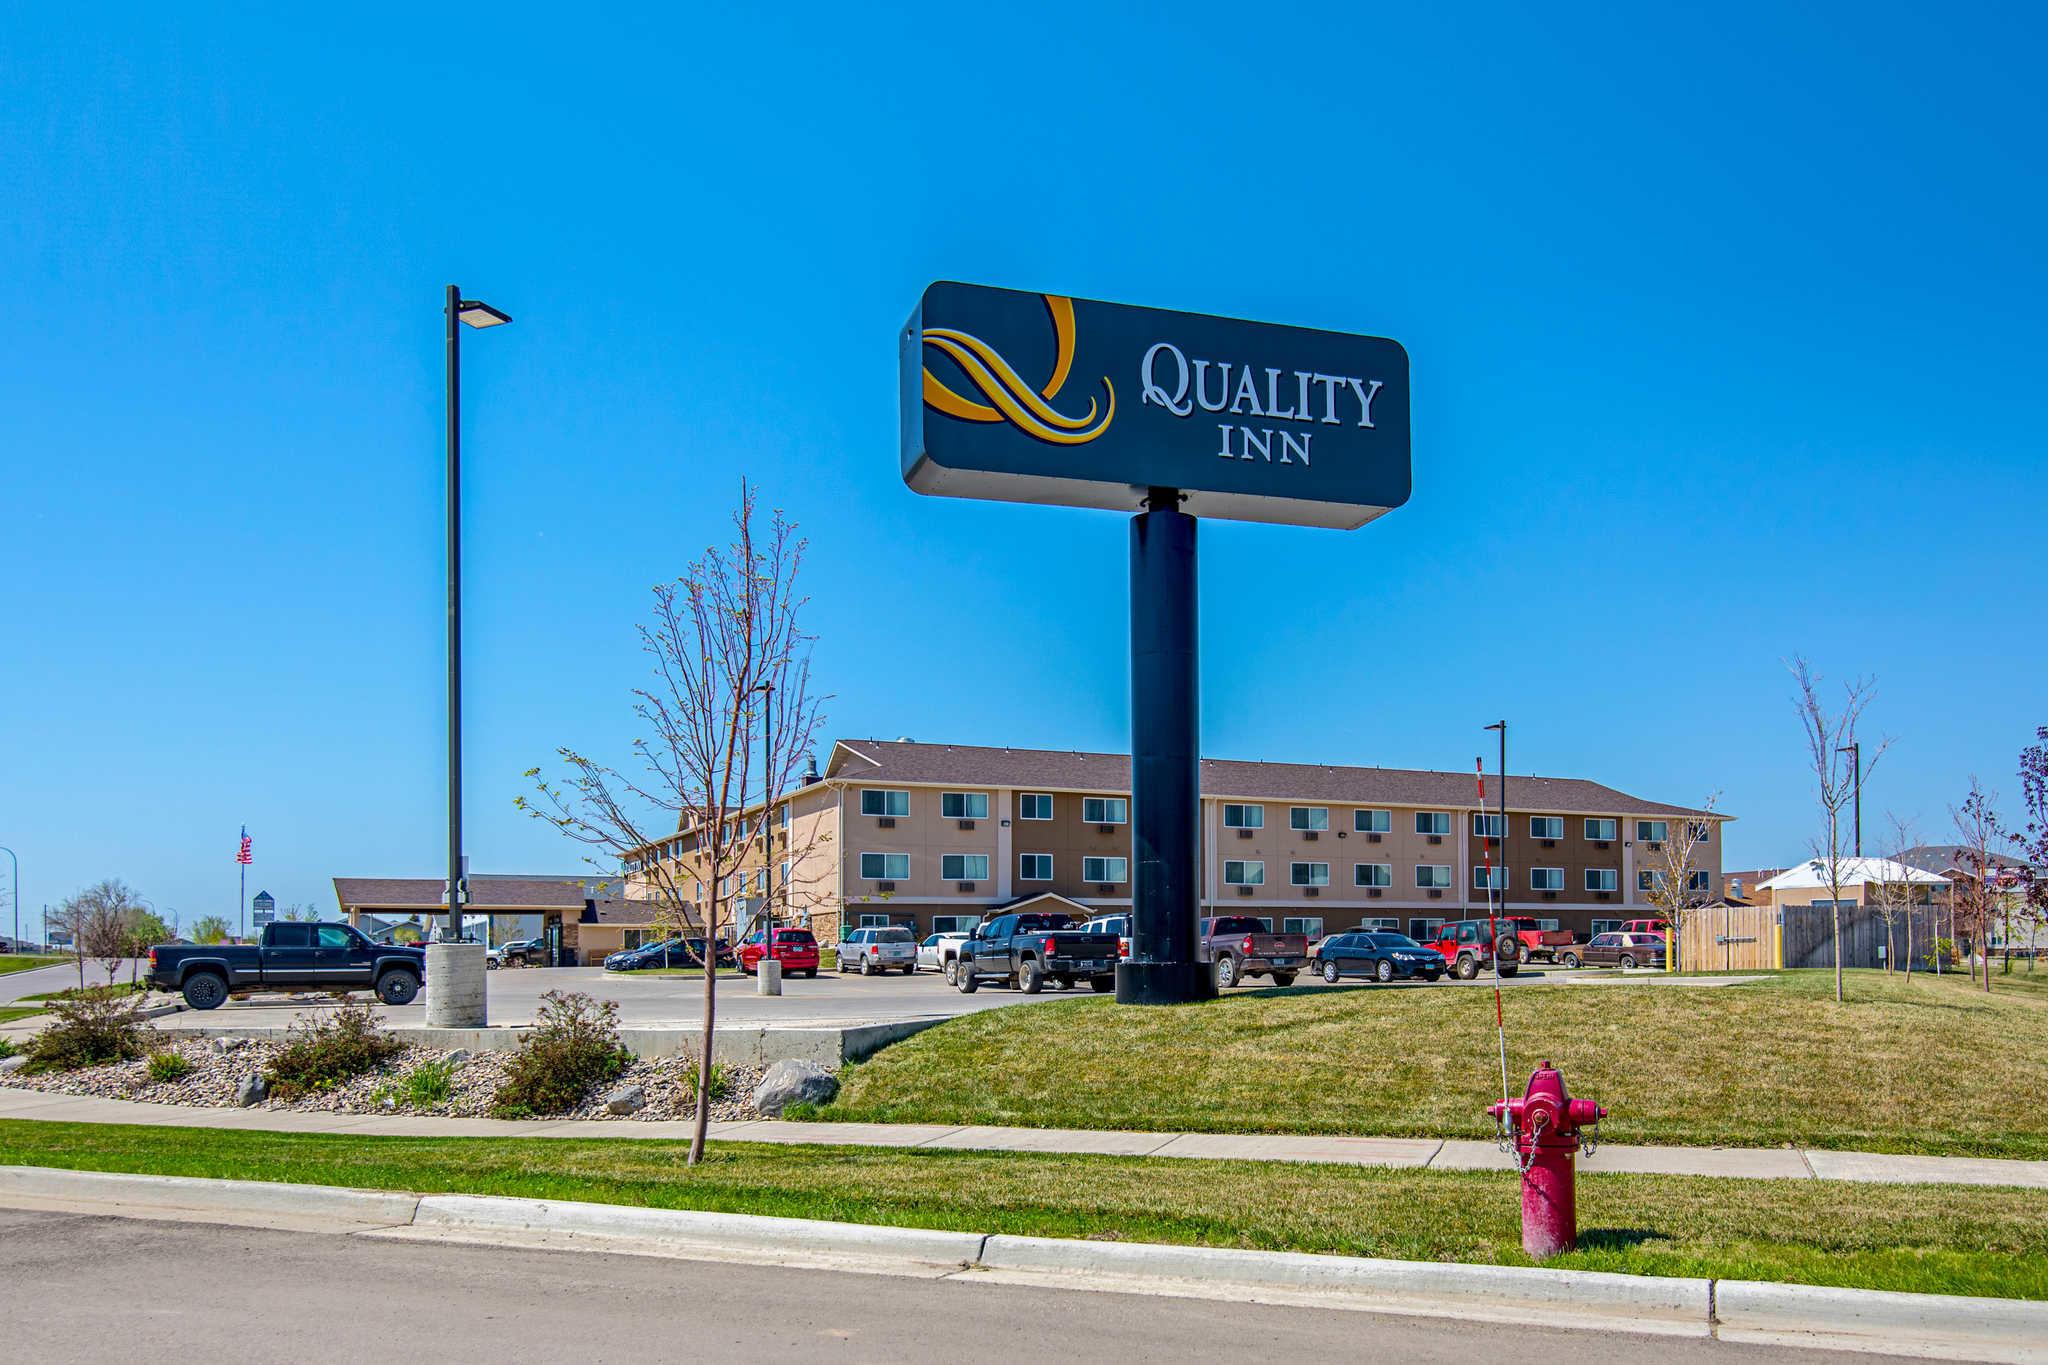 Quality Inn image 0